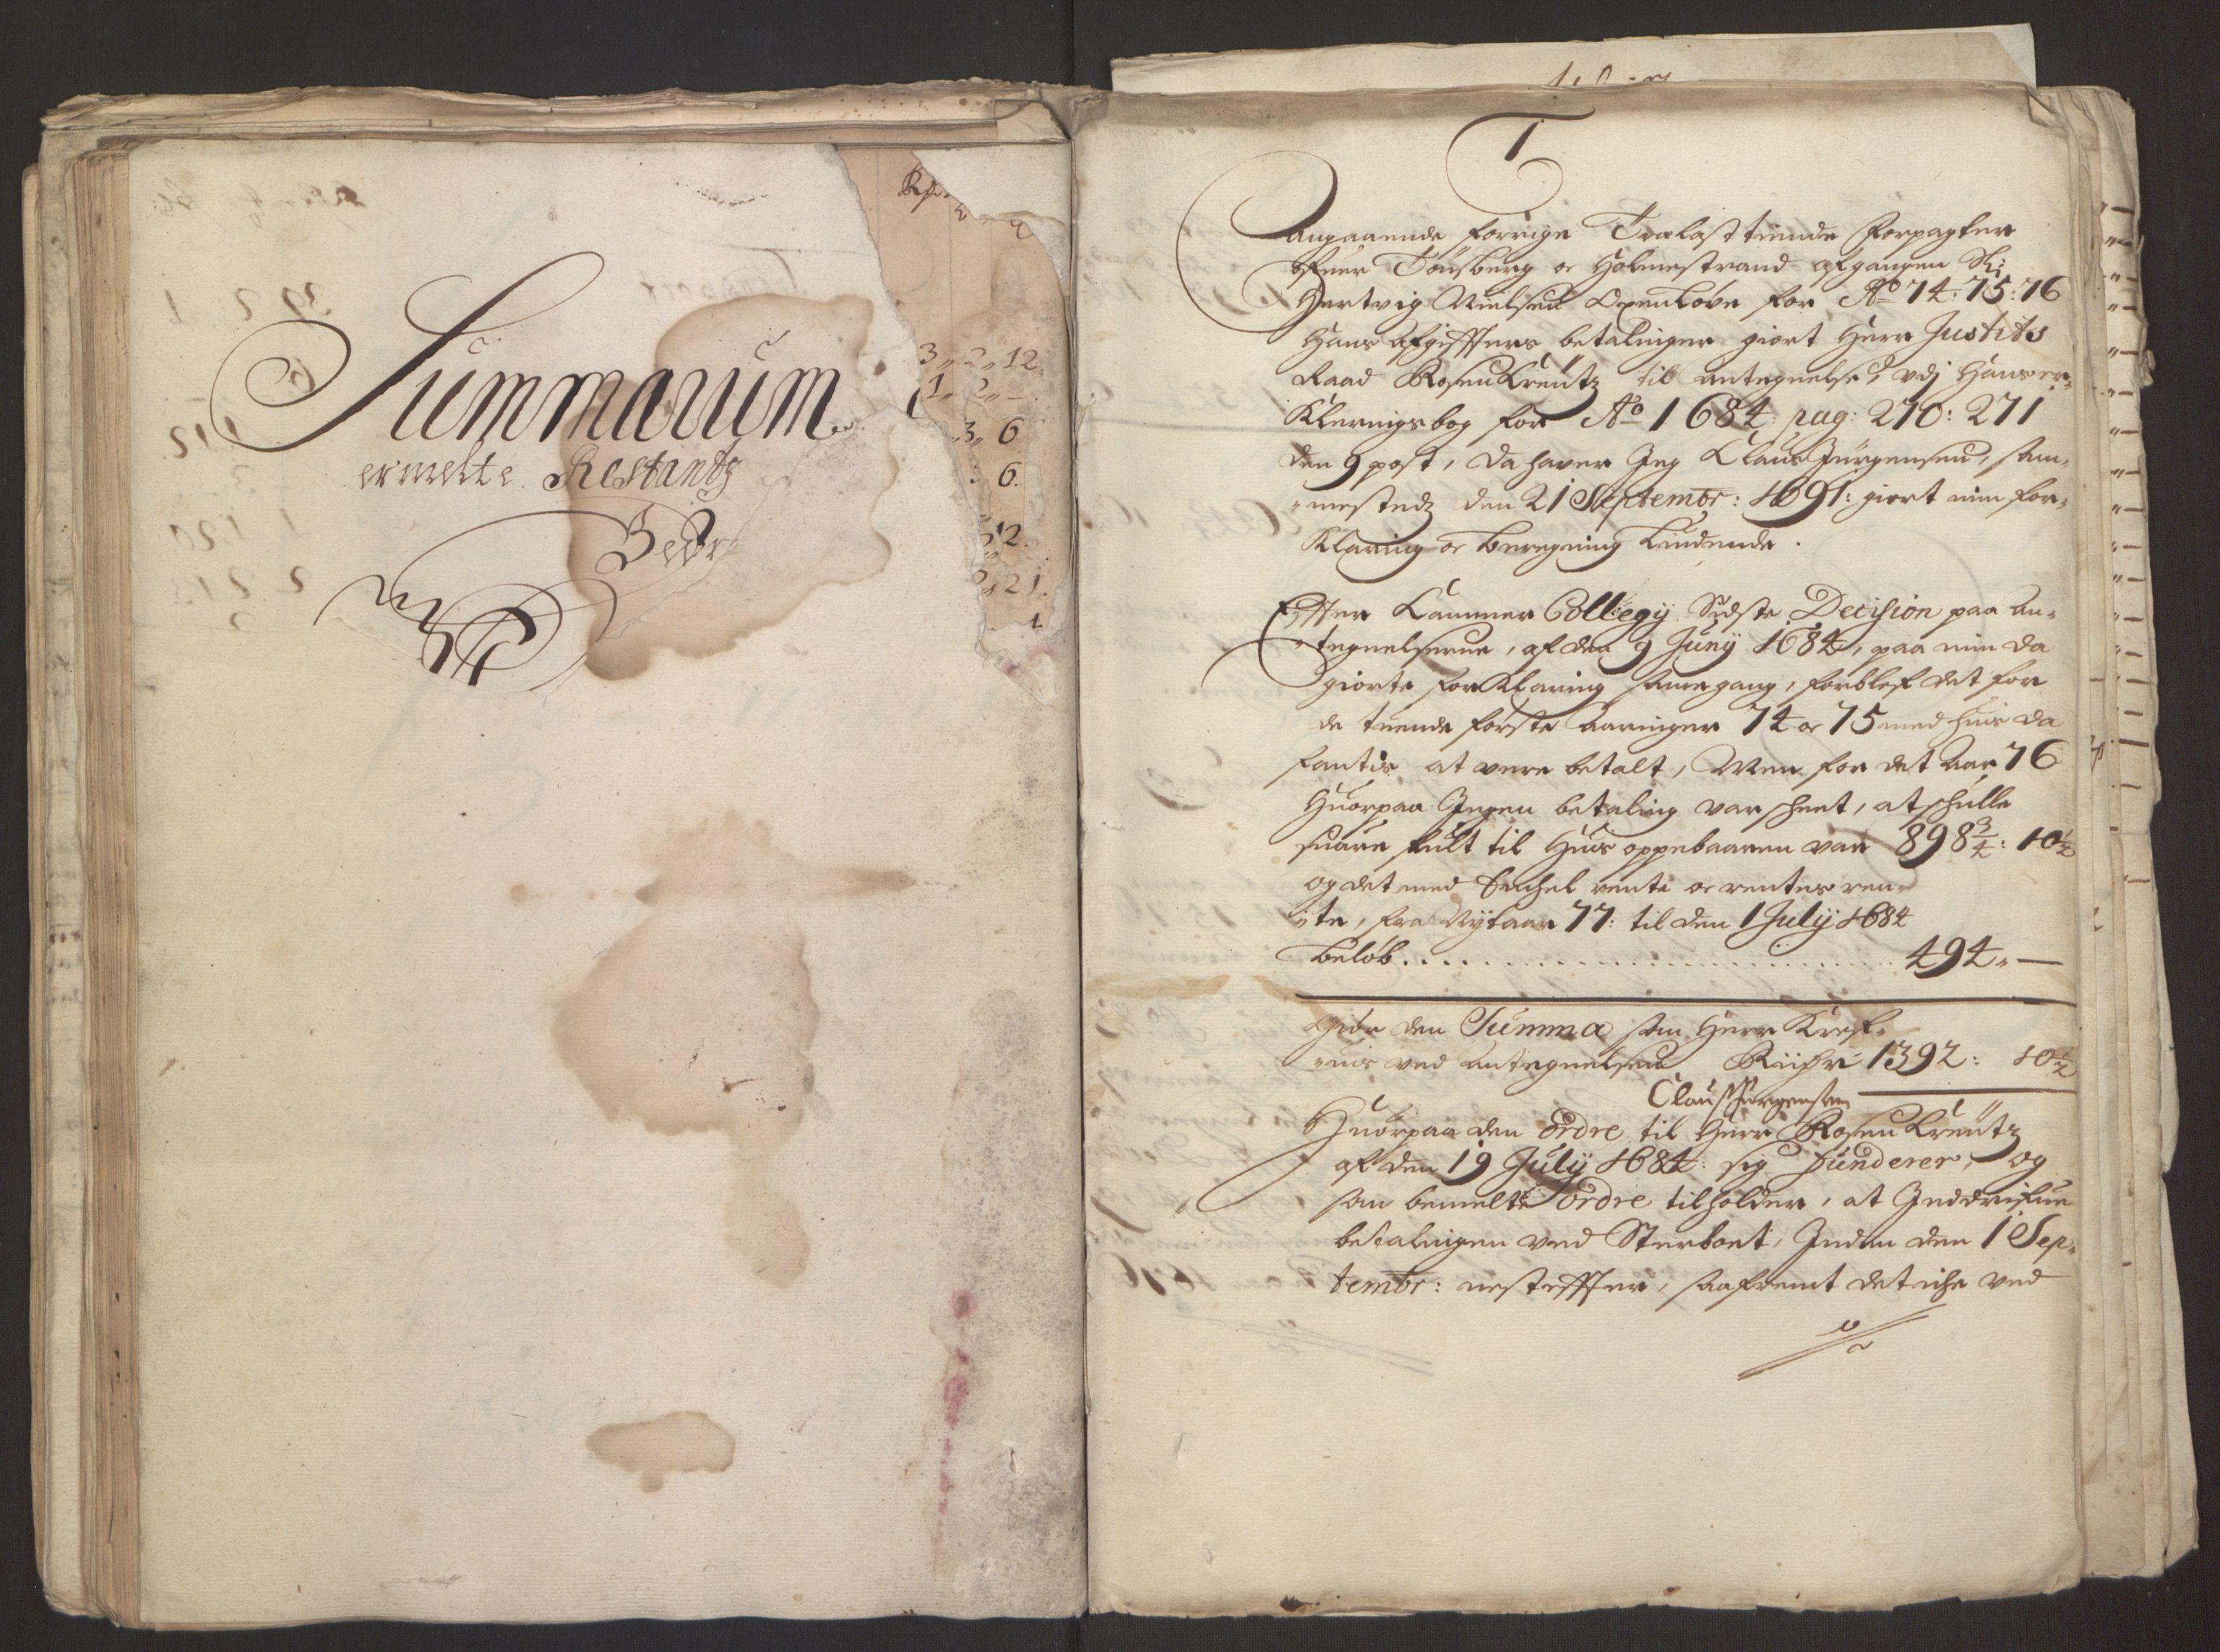 RA, Rentekammeret inntil 1814, Reviderte regnskaper, Fogderegnskap, R32/L1843: Fogderegnskap Jarlsberg grevskap, 1674-1675, s. 92